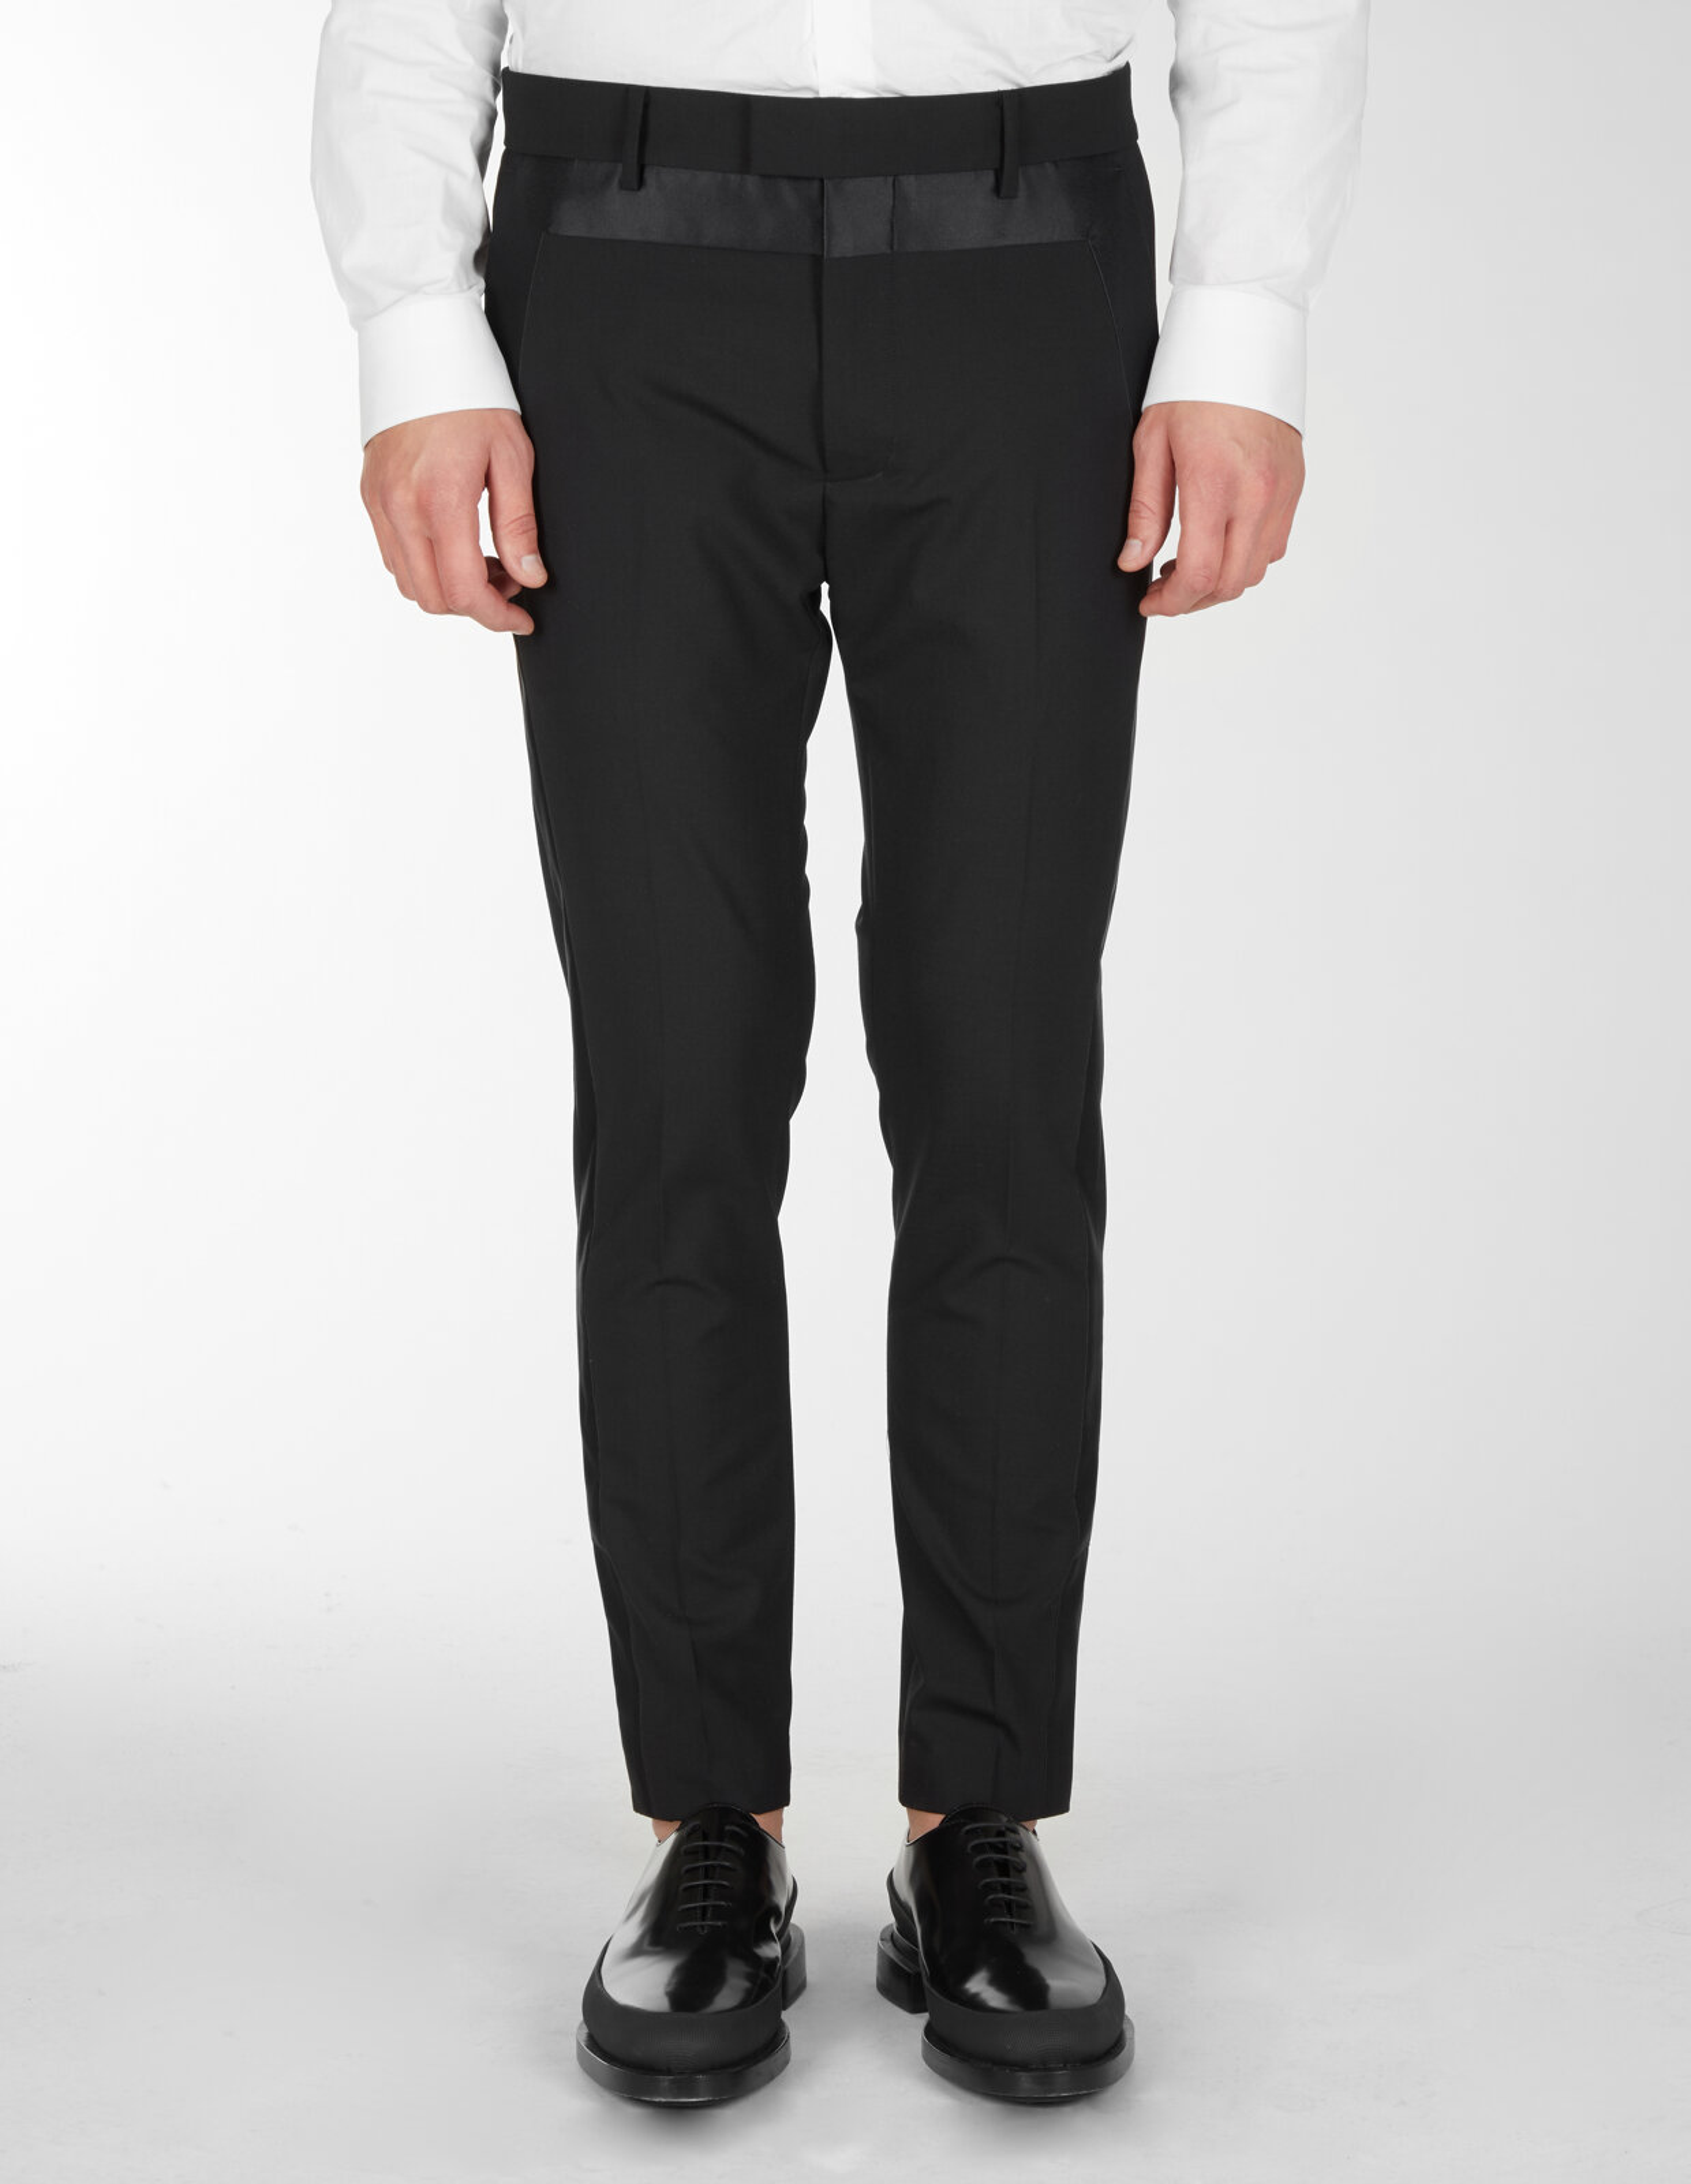 Pantaloni Con Raso - Les Hommes